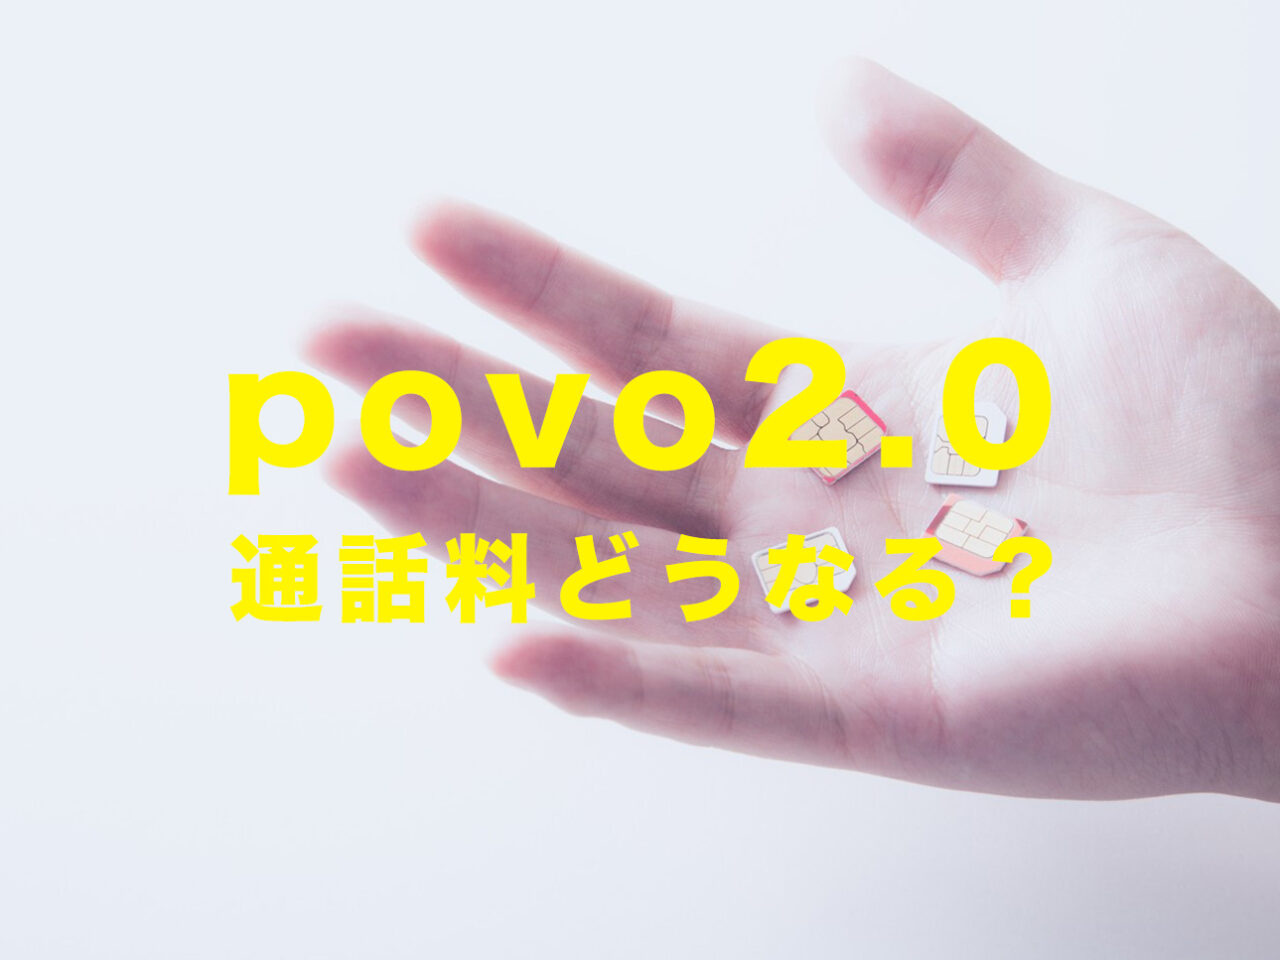 povo 2.0で通話料はどうなる?ポヴォ新プランを解説!のサムネイル画像